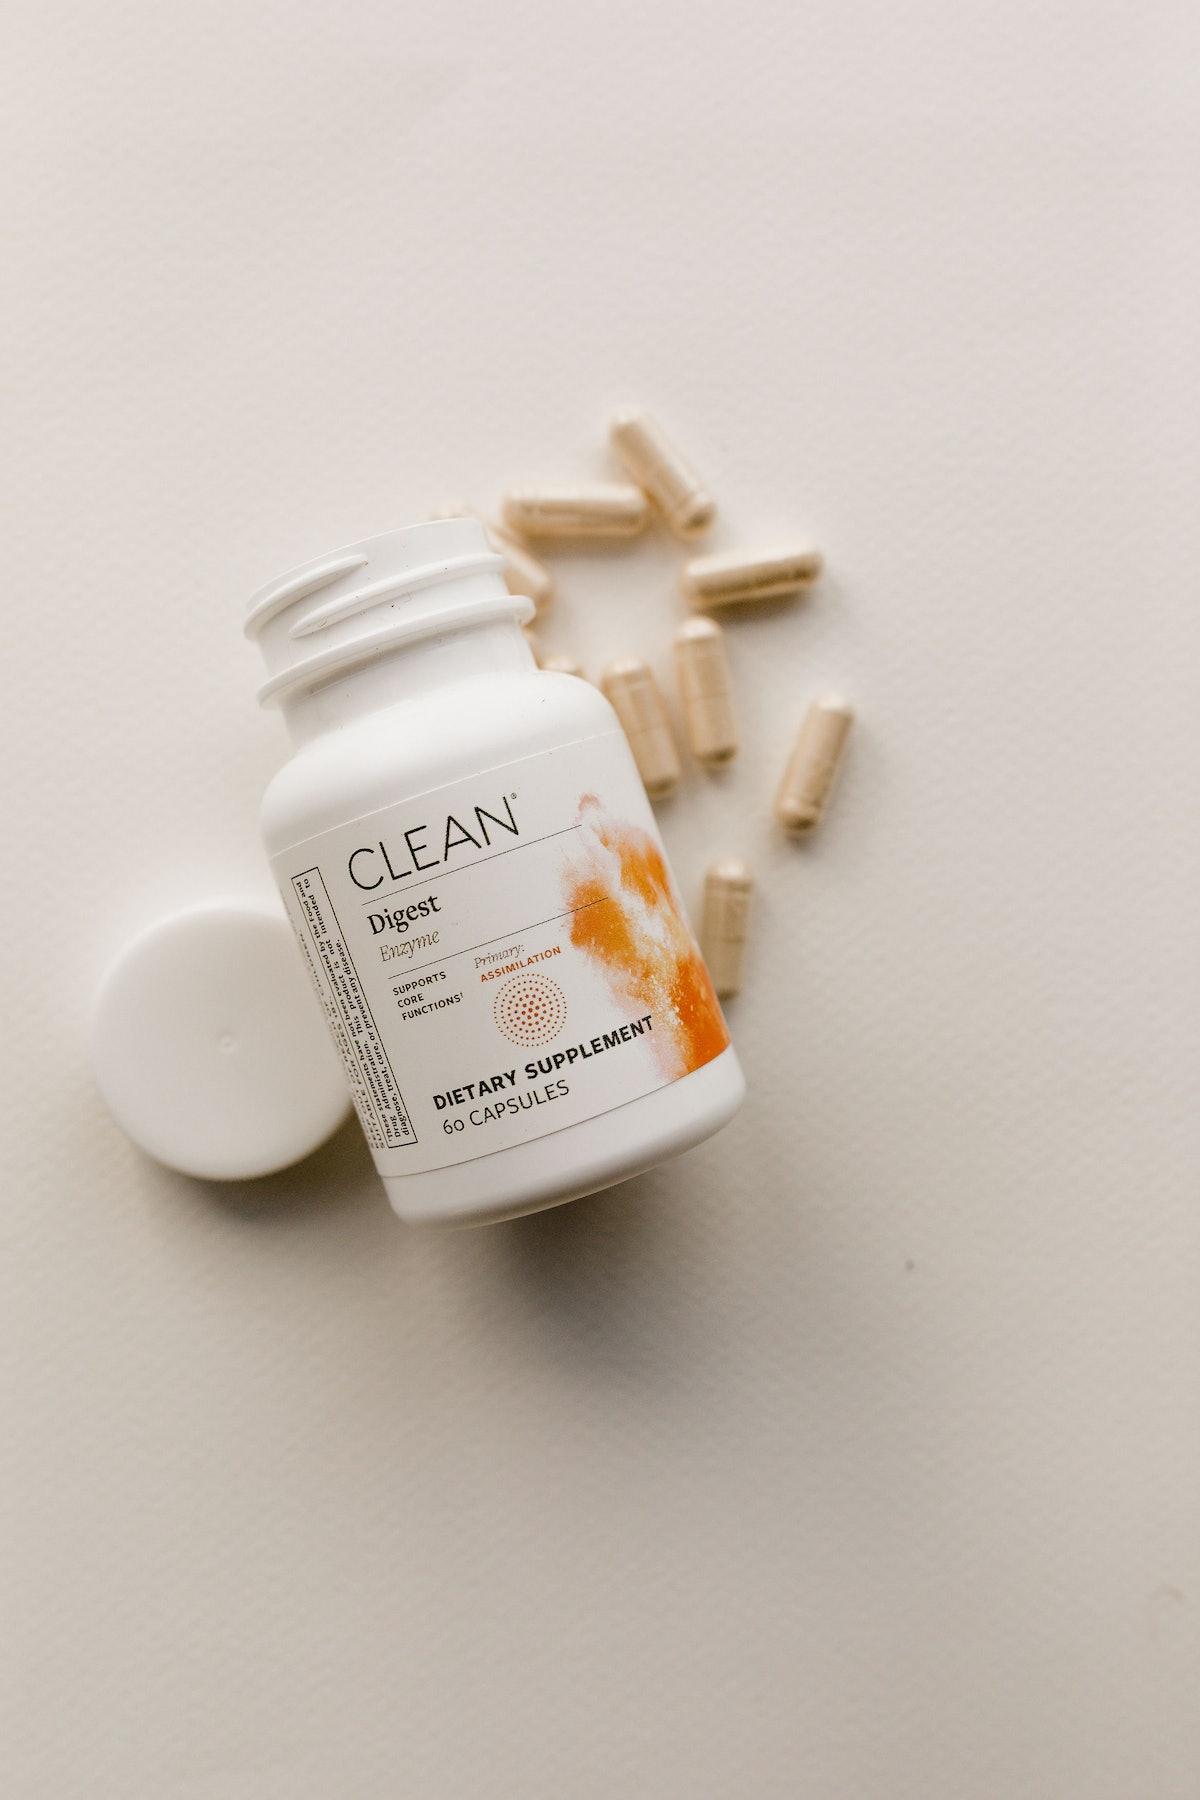 Clean Program supplements